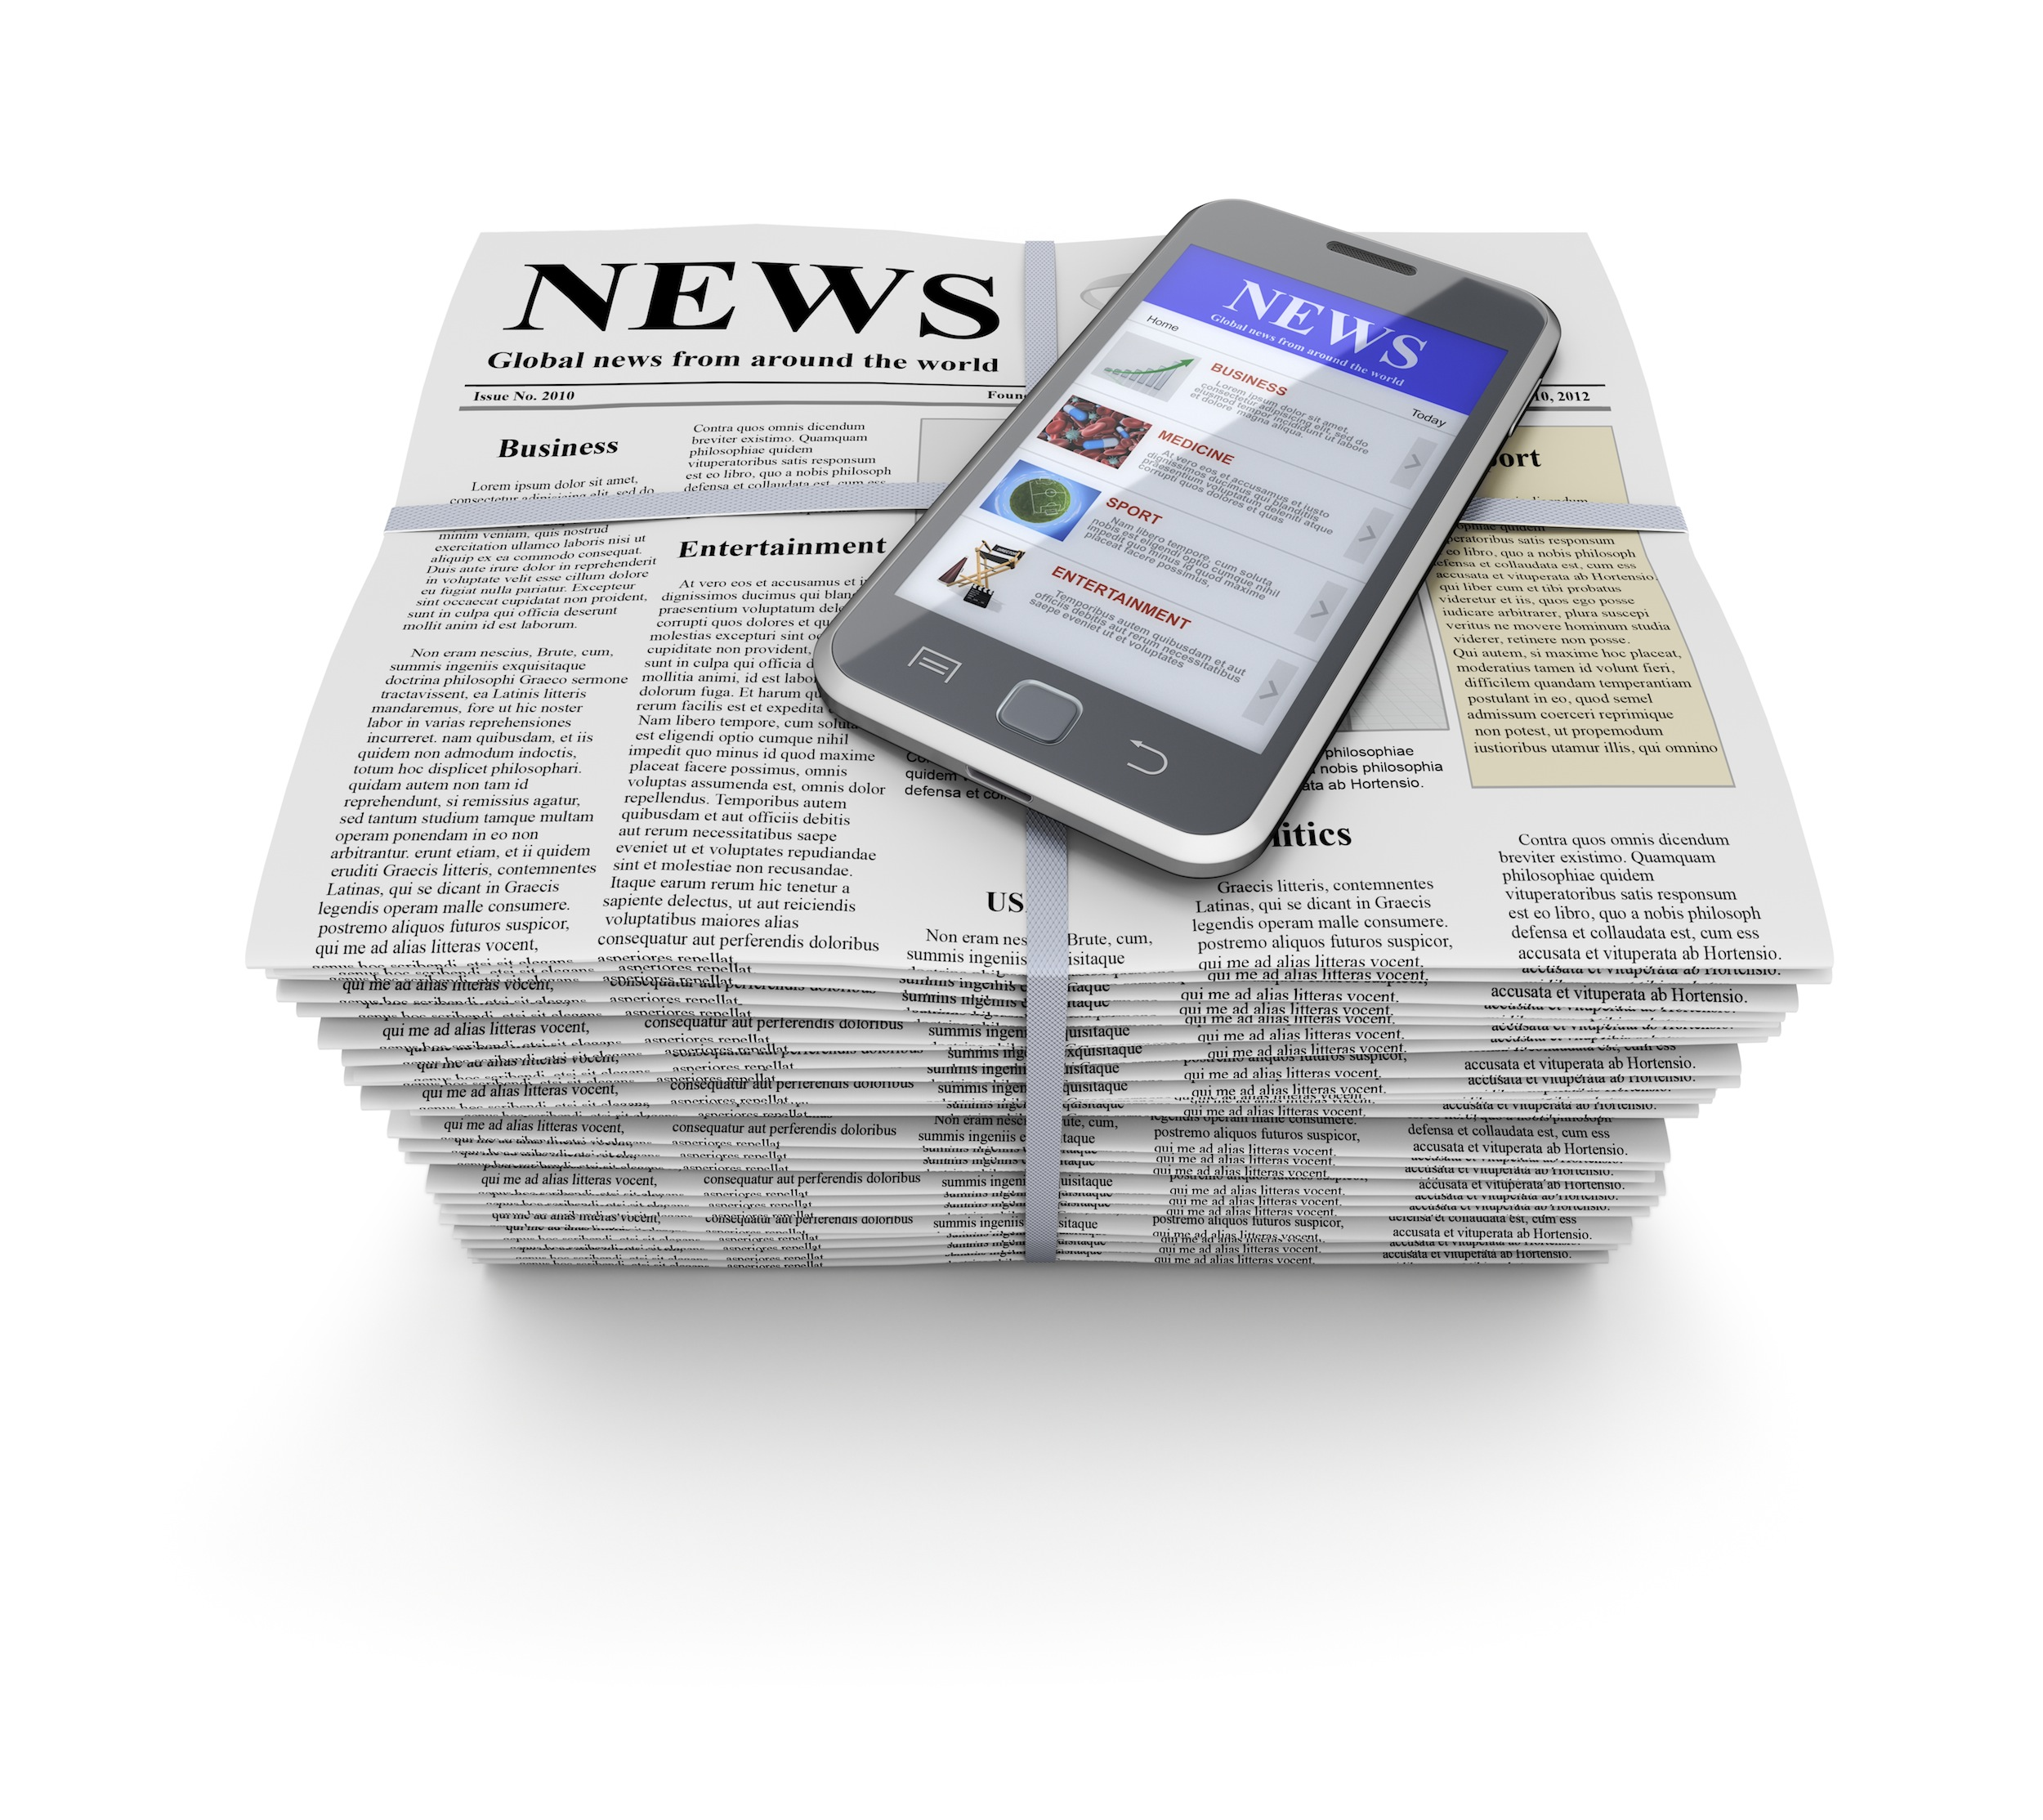 Realidad Aumentada aplicada a periodicos,revistas,catalogos,flyers,folletos